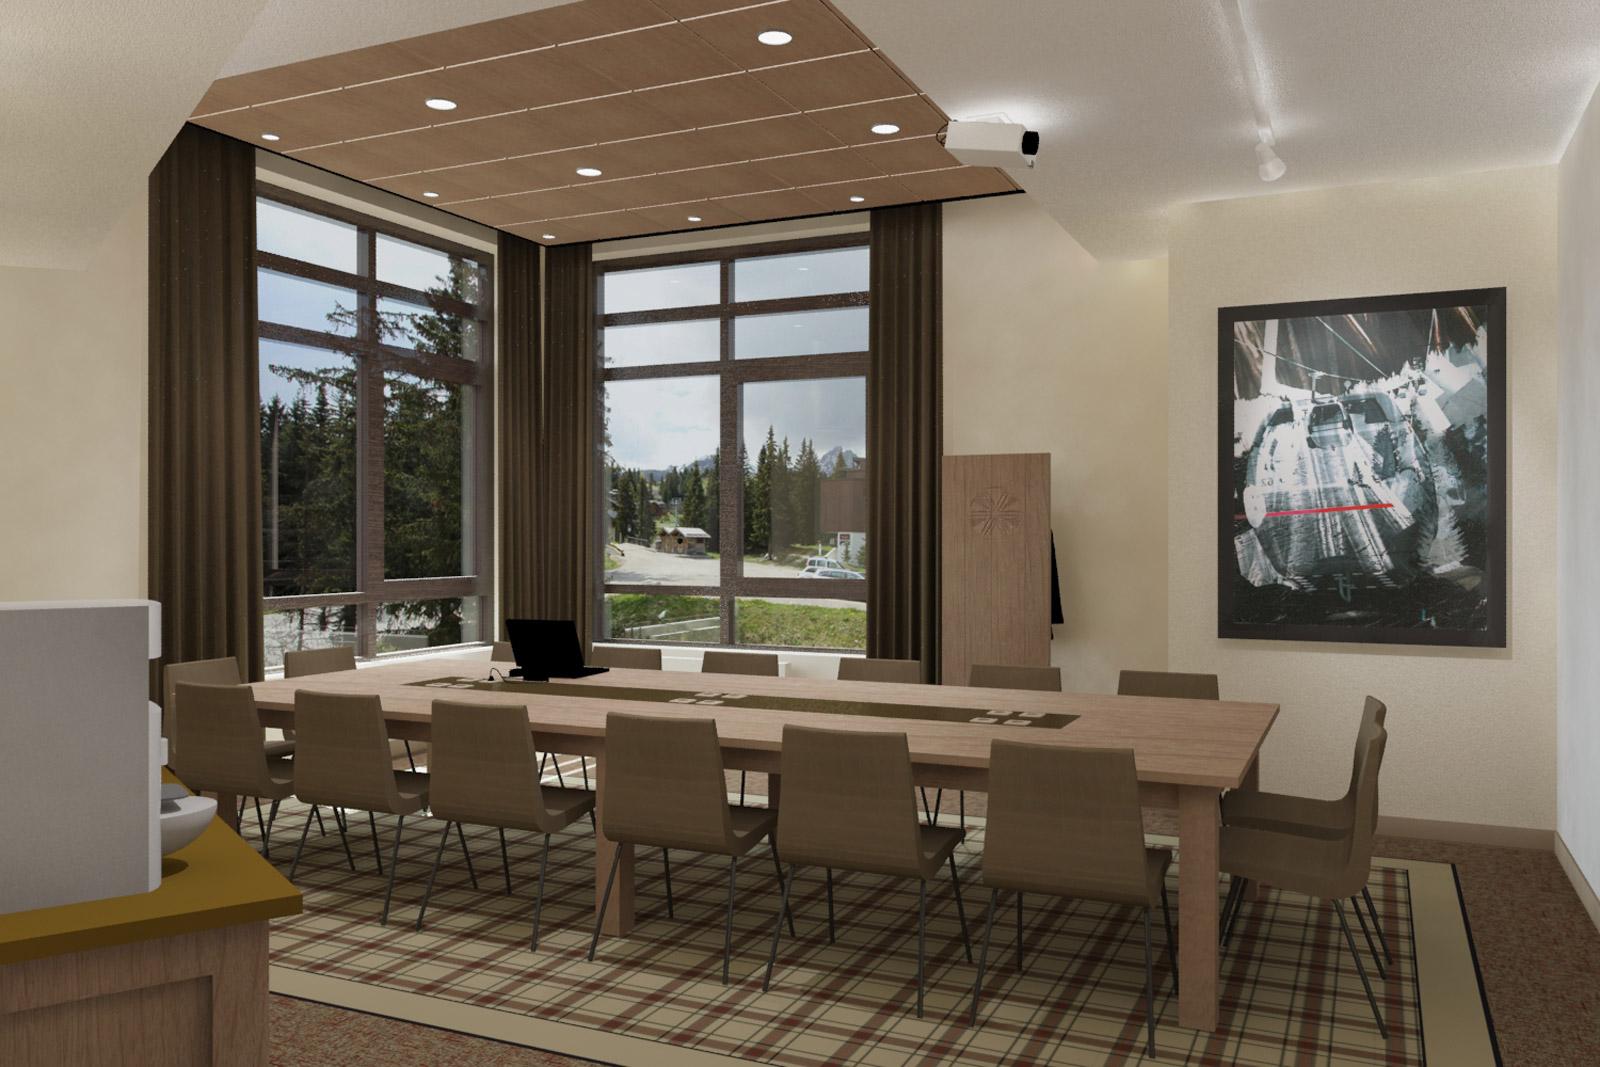 Salon 1 - image 3D v2